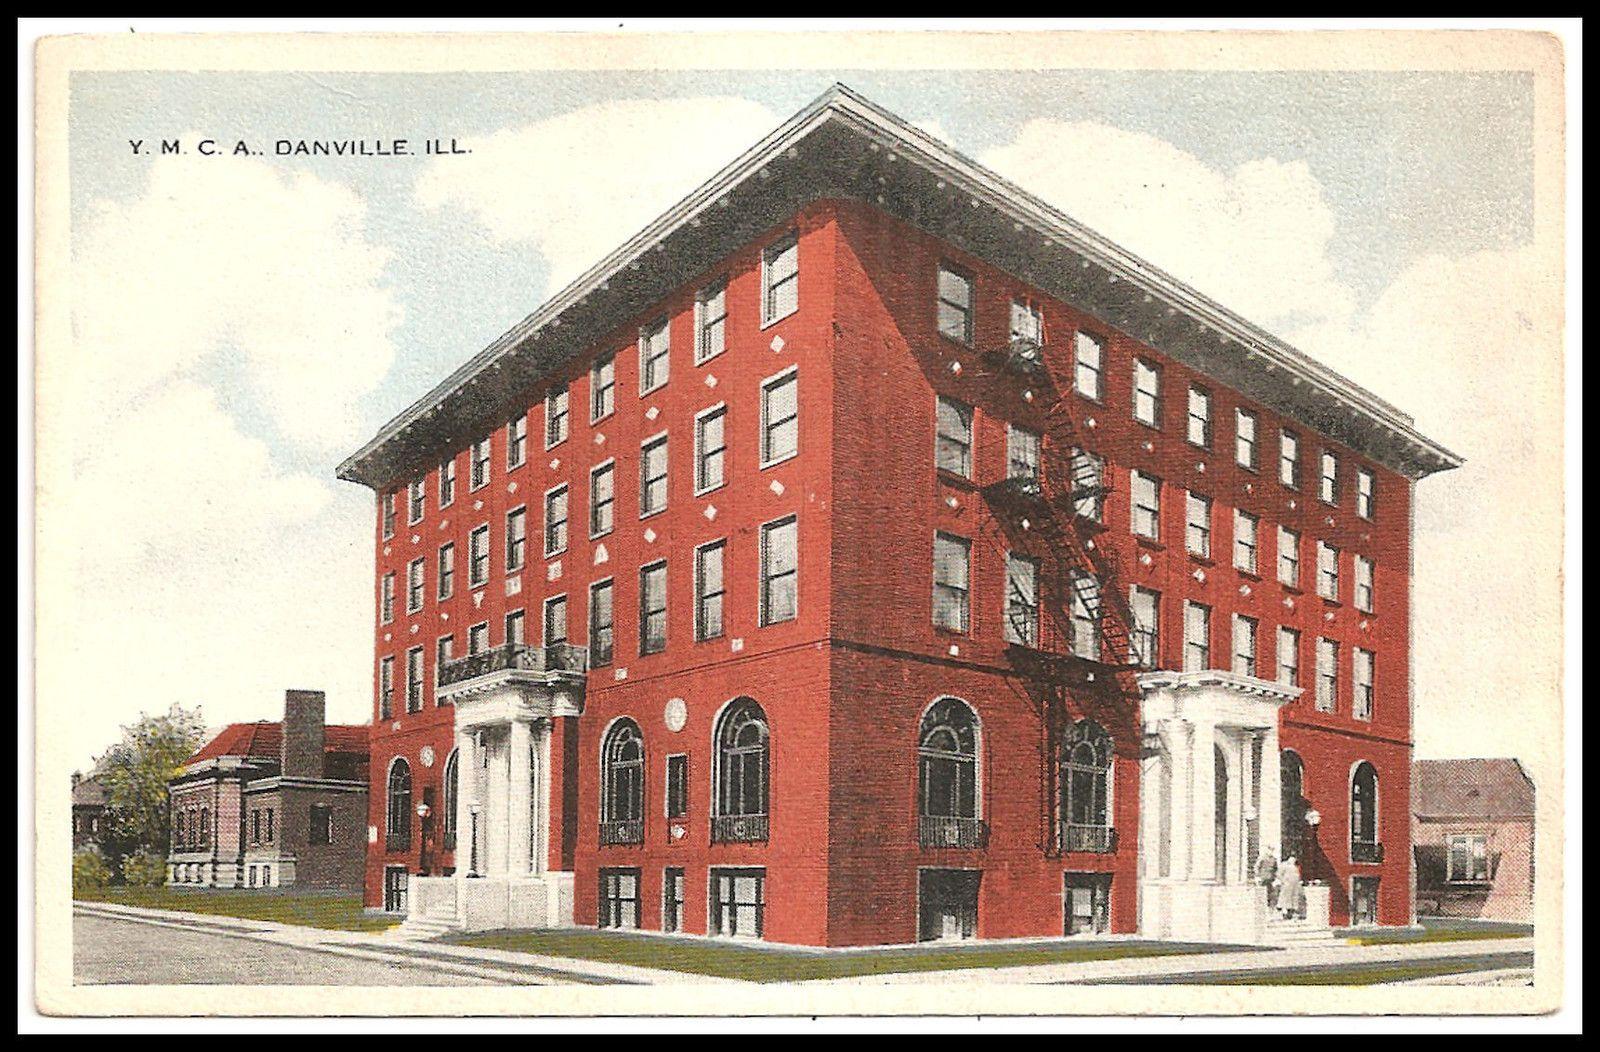 Danville Il Ymca Postcard 8271917 Danville Illinois